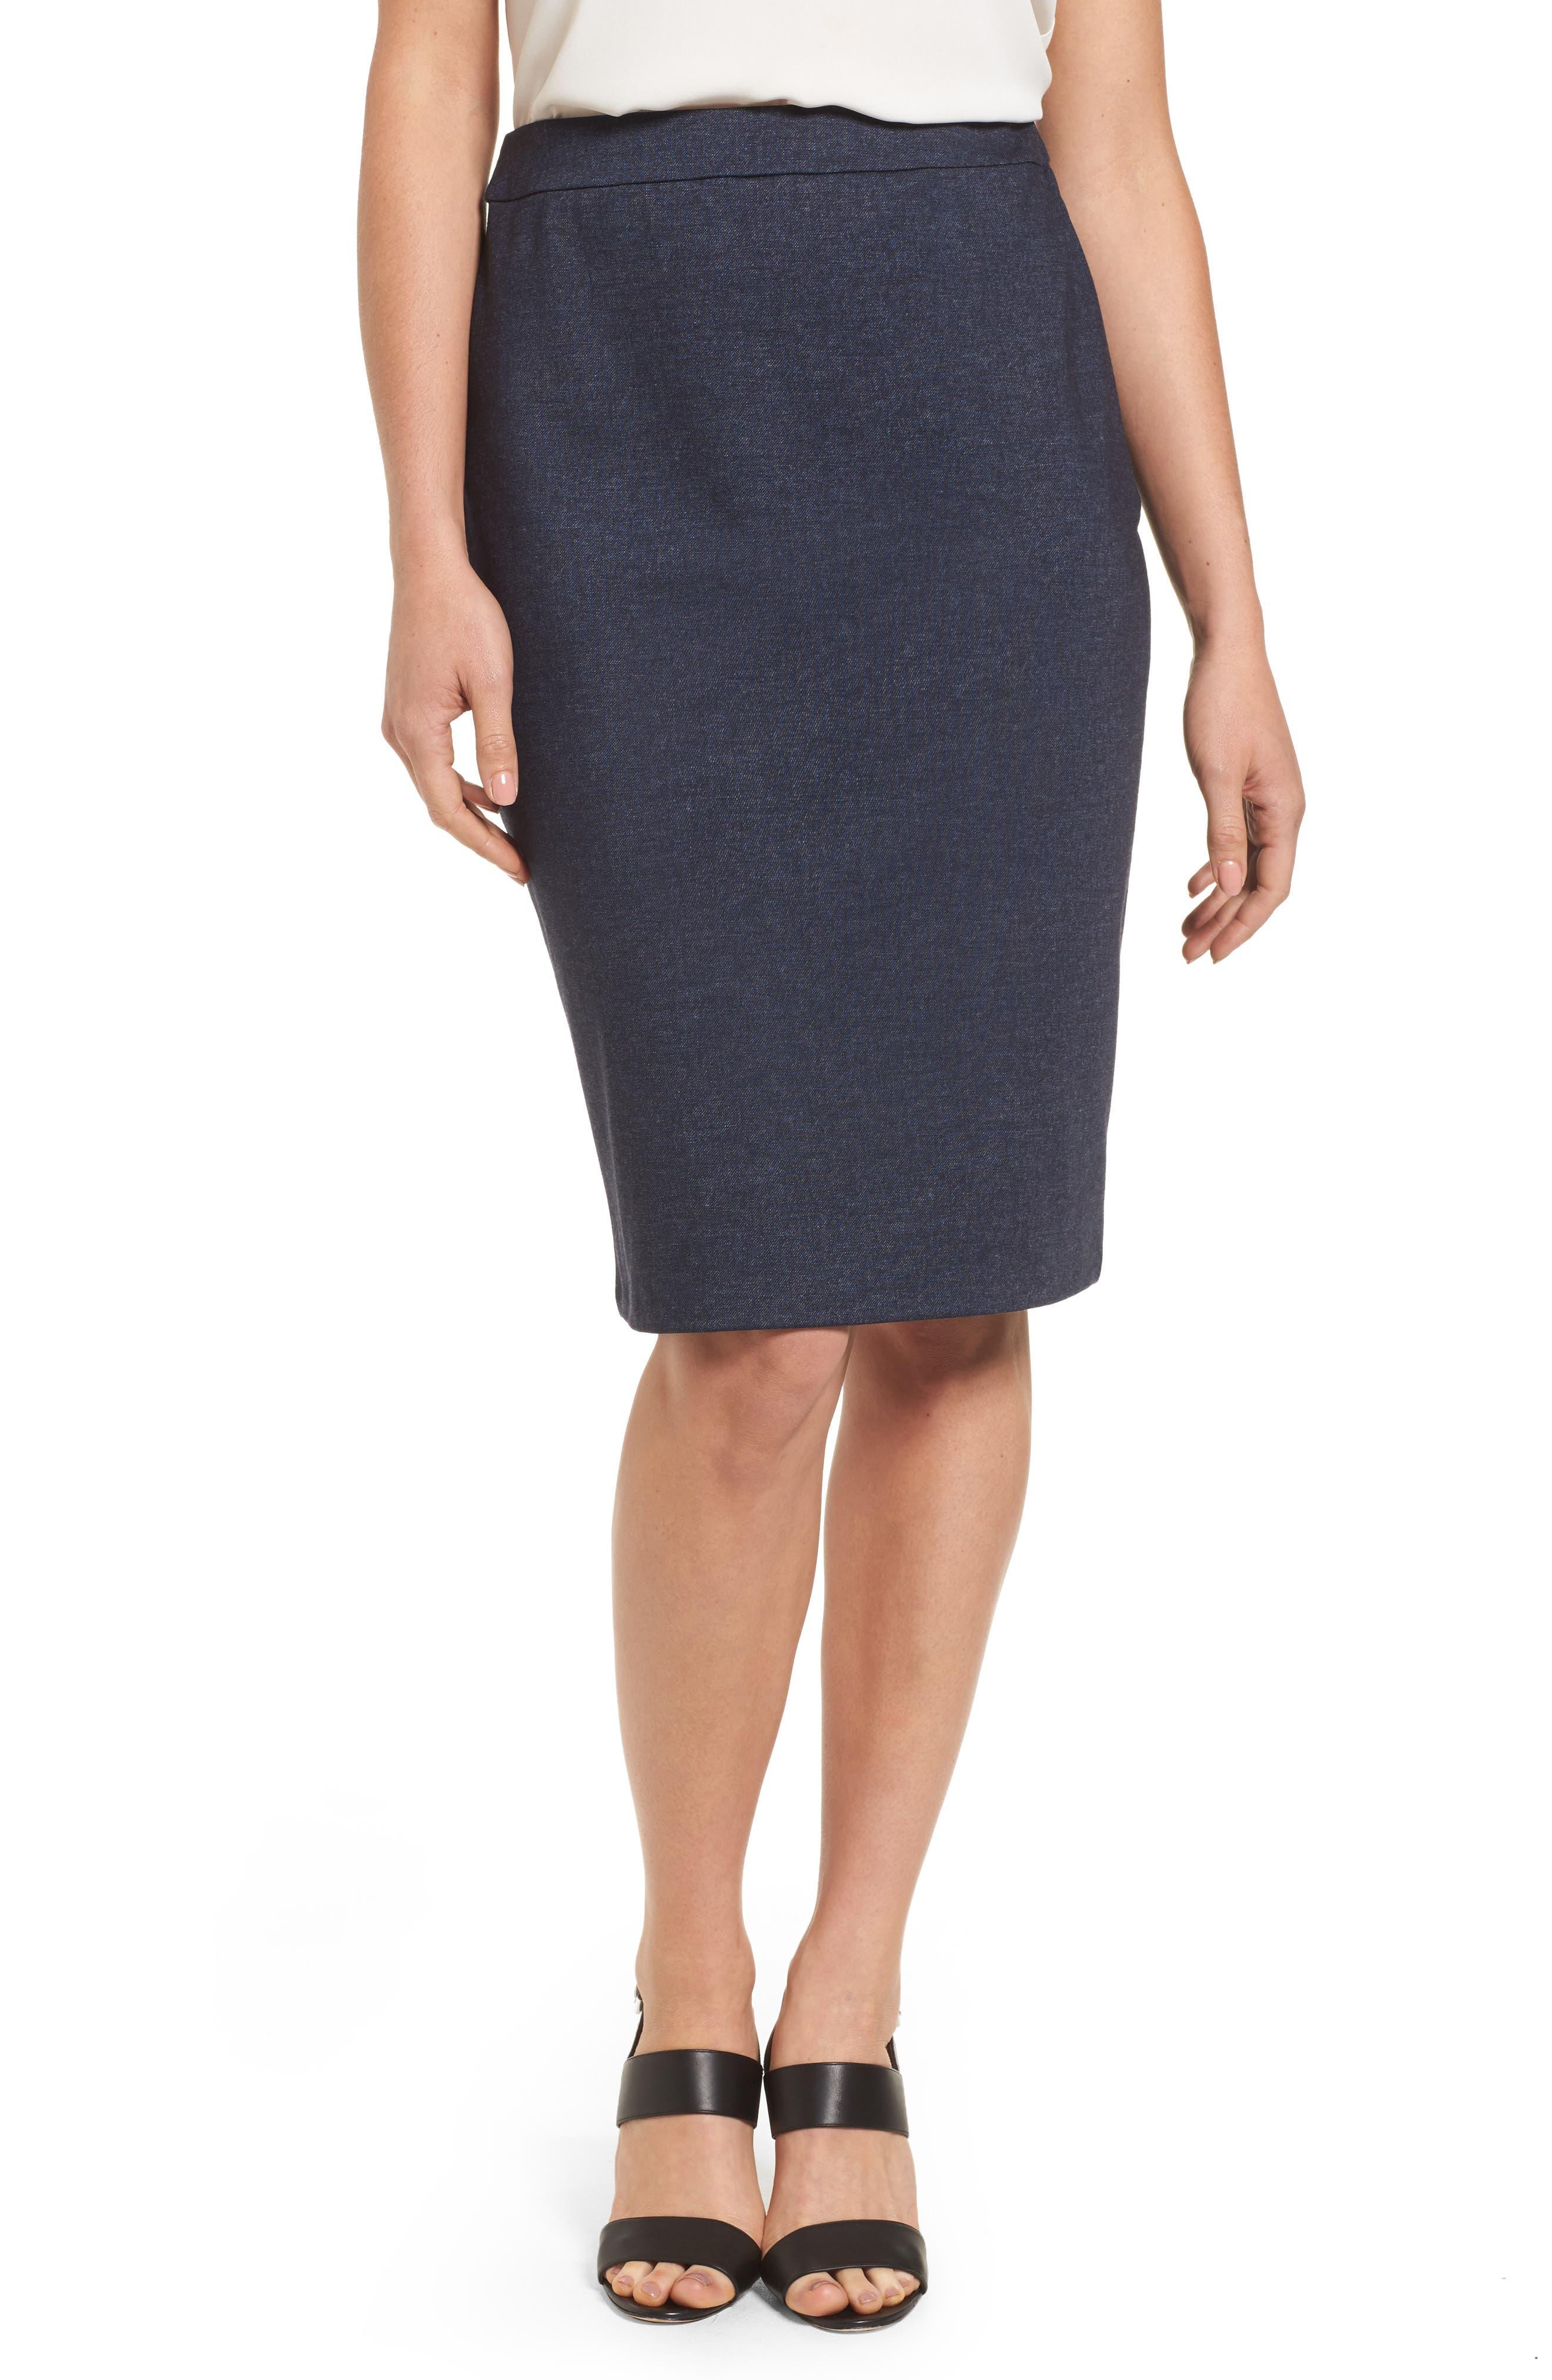 Alternate Image 1 Selected - Halogen® Knit Pencil Skirt (Regular & Petite)